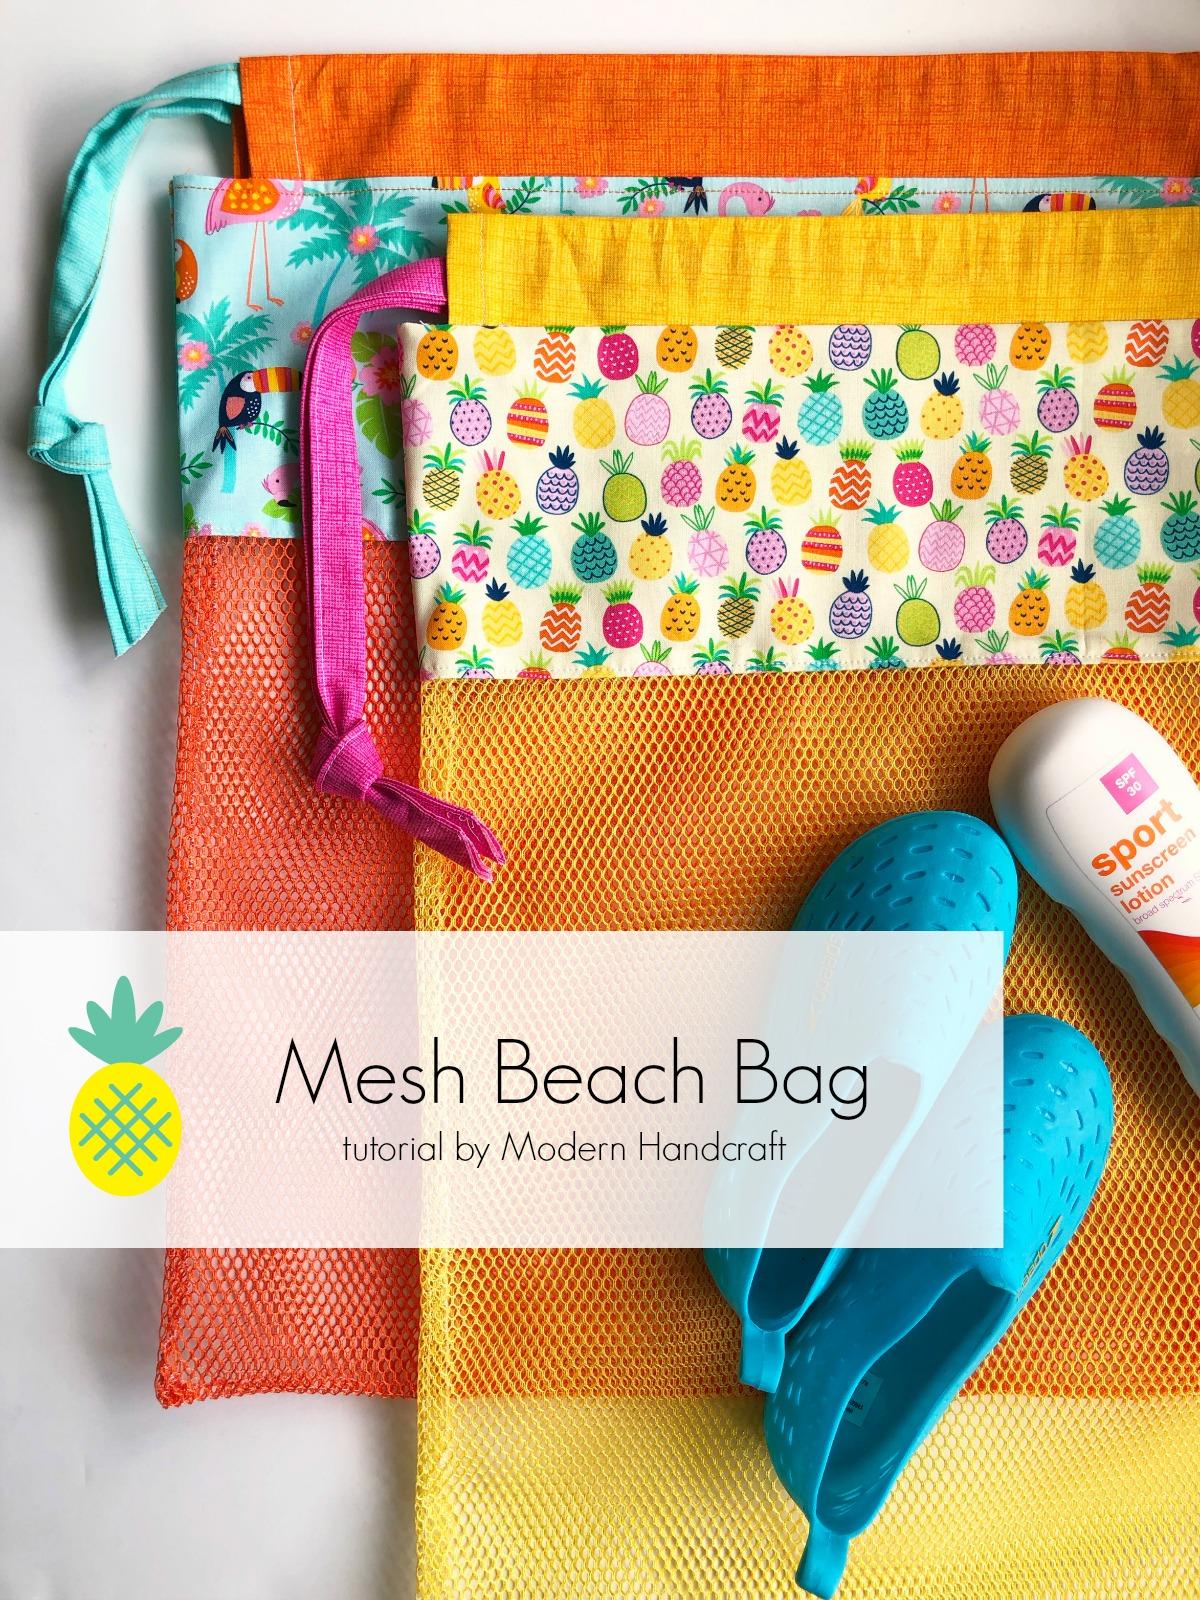 Mesh Beach Bag - tutorial for Timeless Treasures